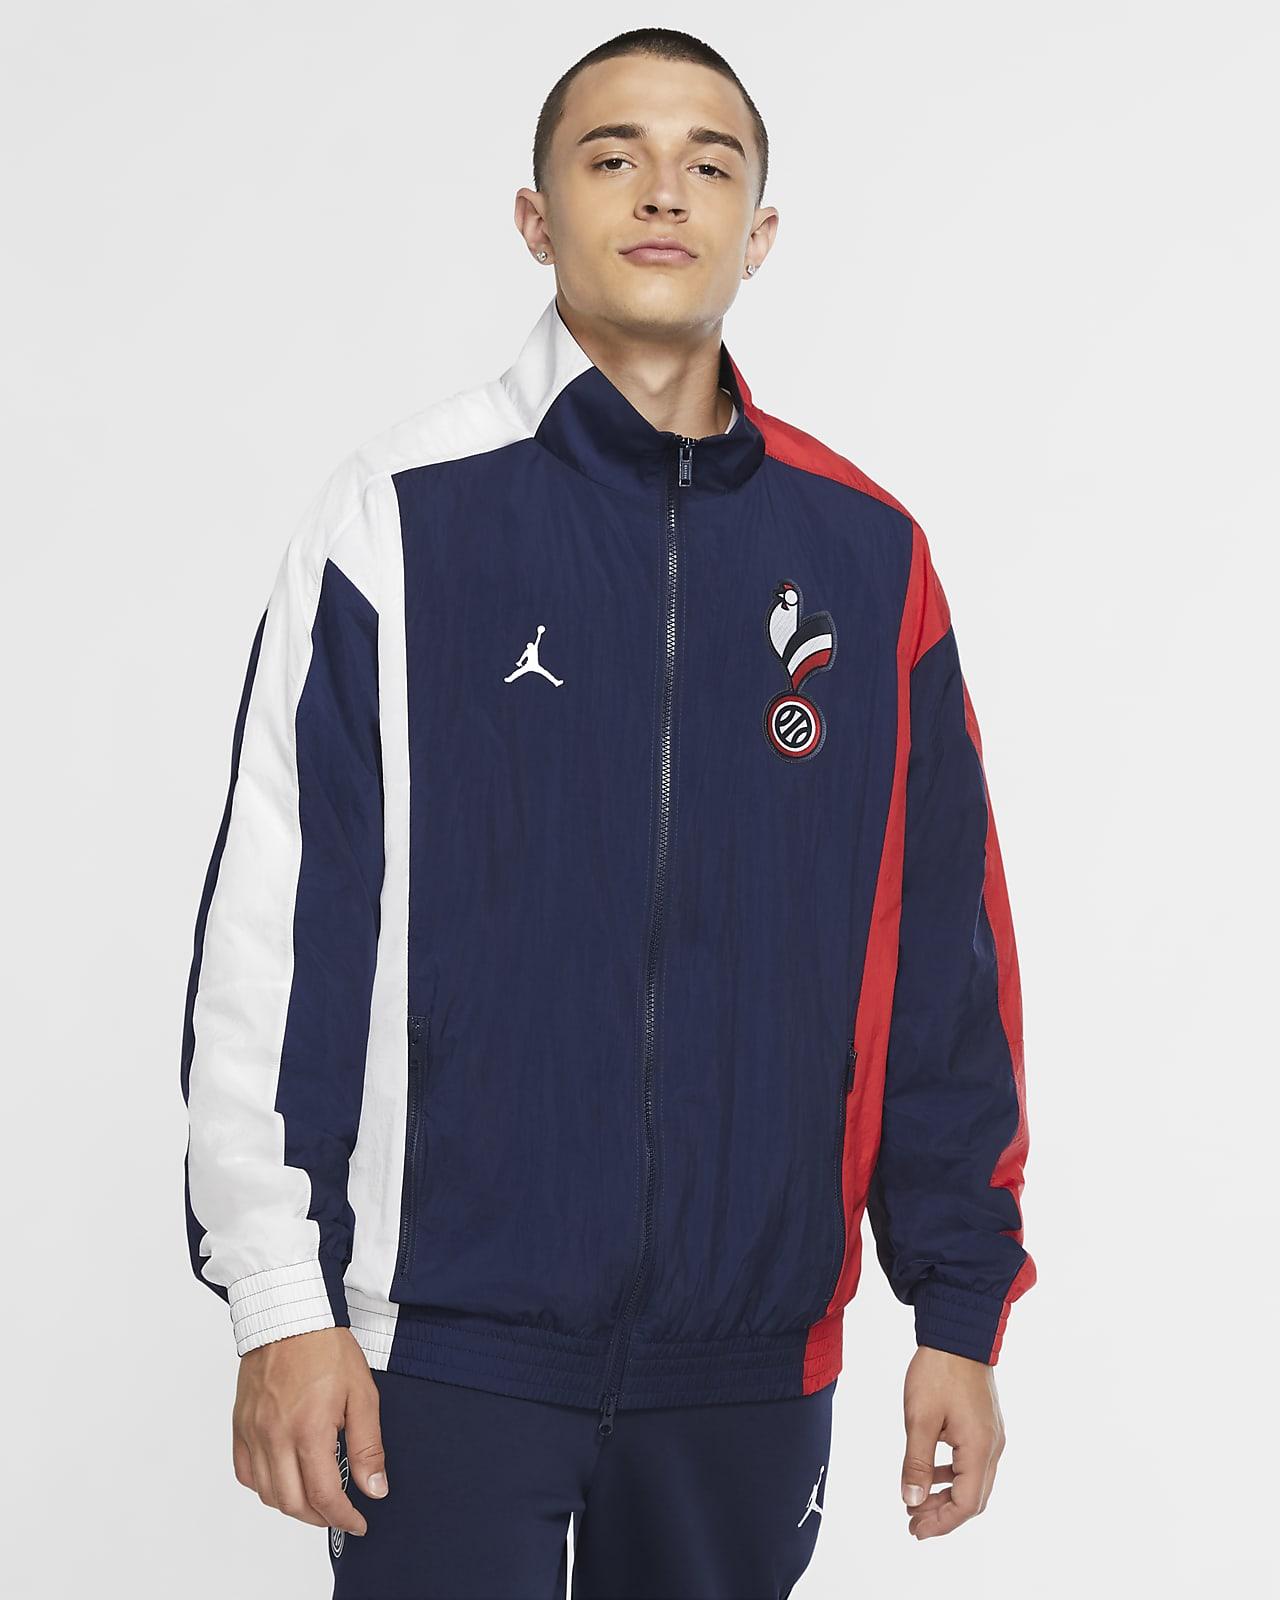 Frankreich Air Jordan Herren-Trainingsjacke